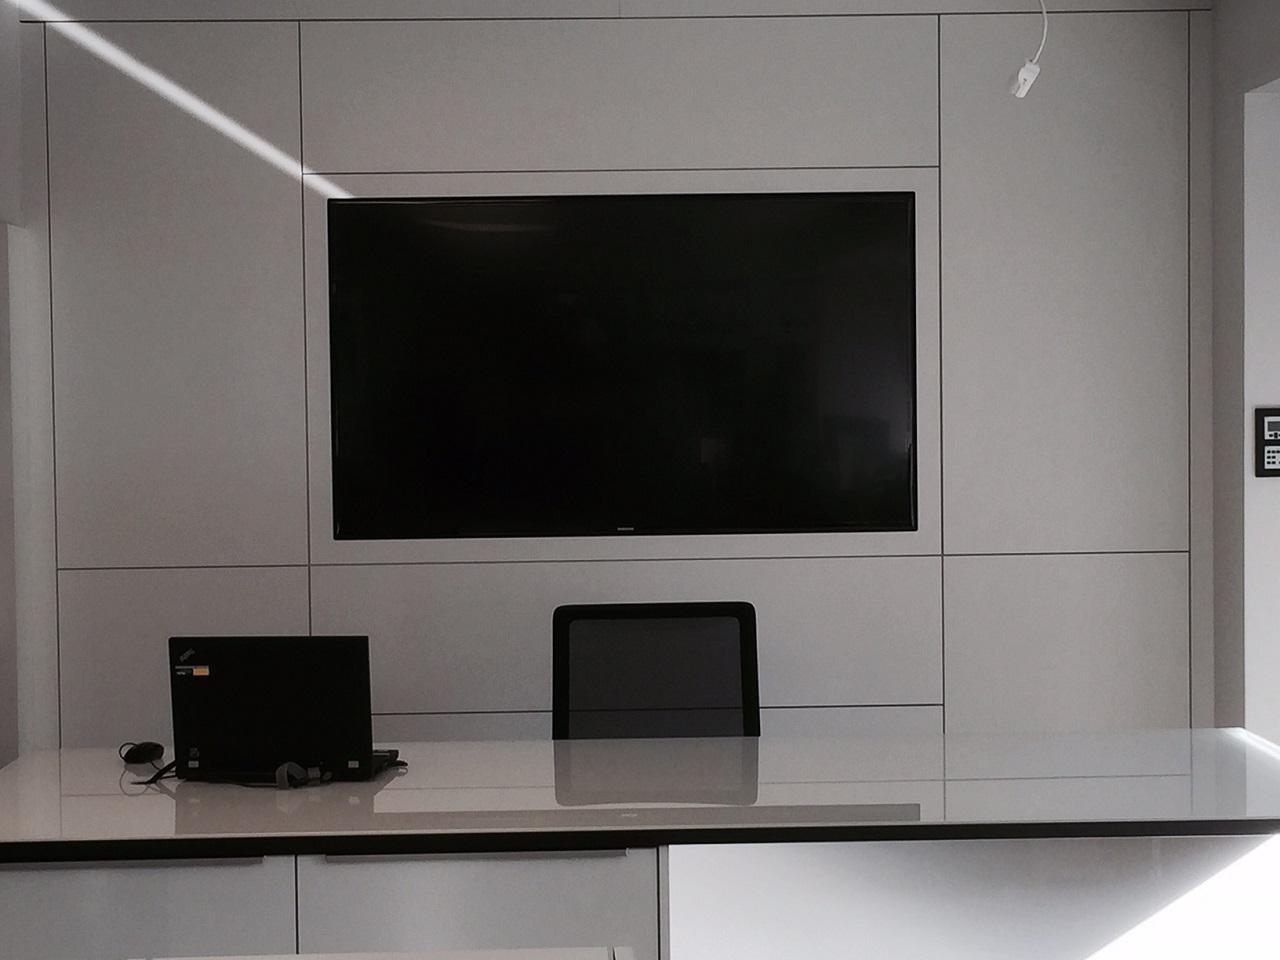 Büro_Samsung_Einbau1